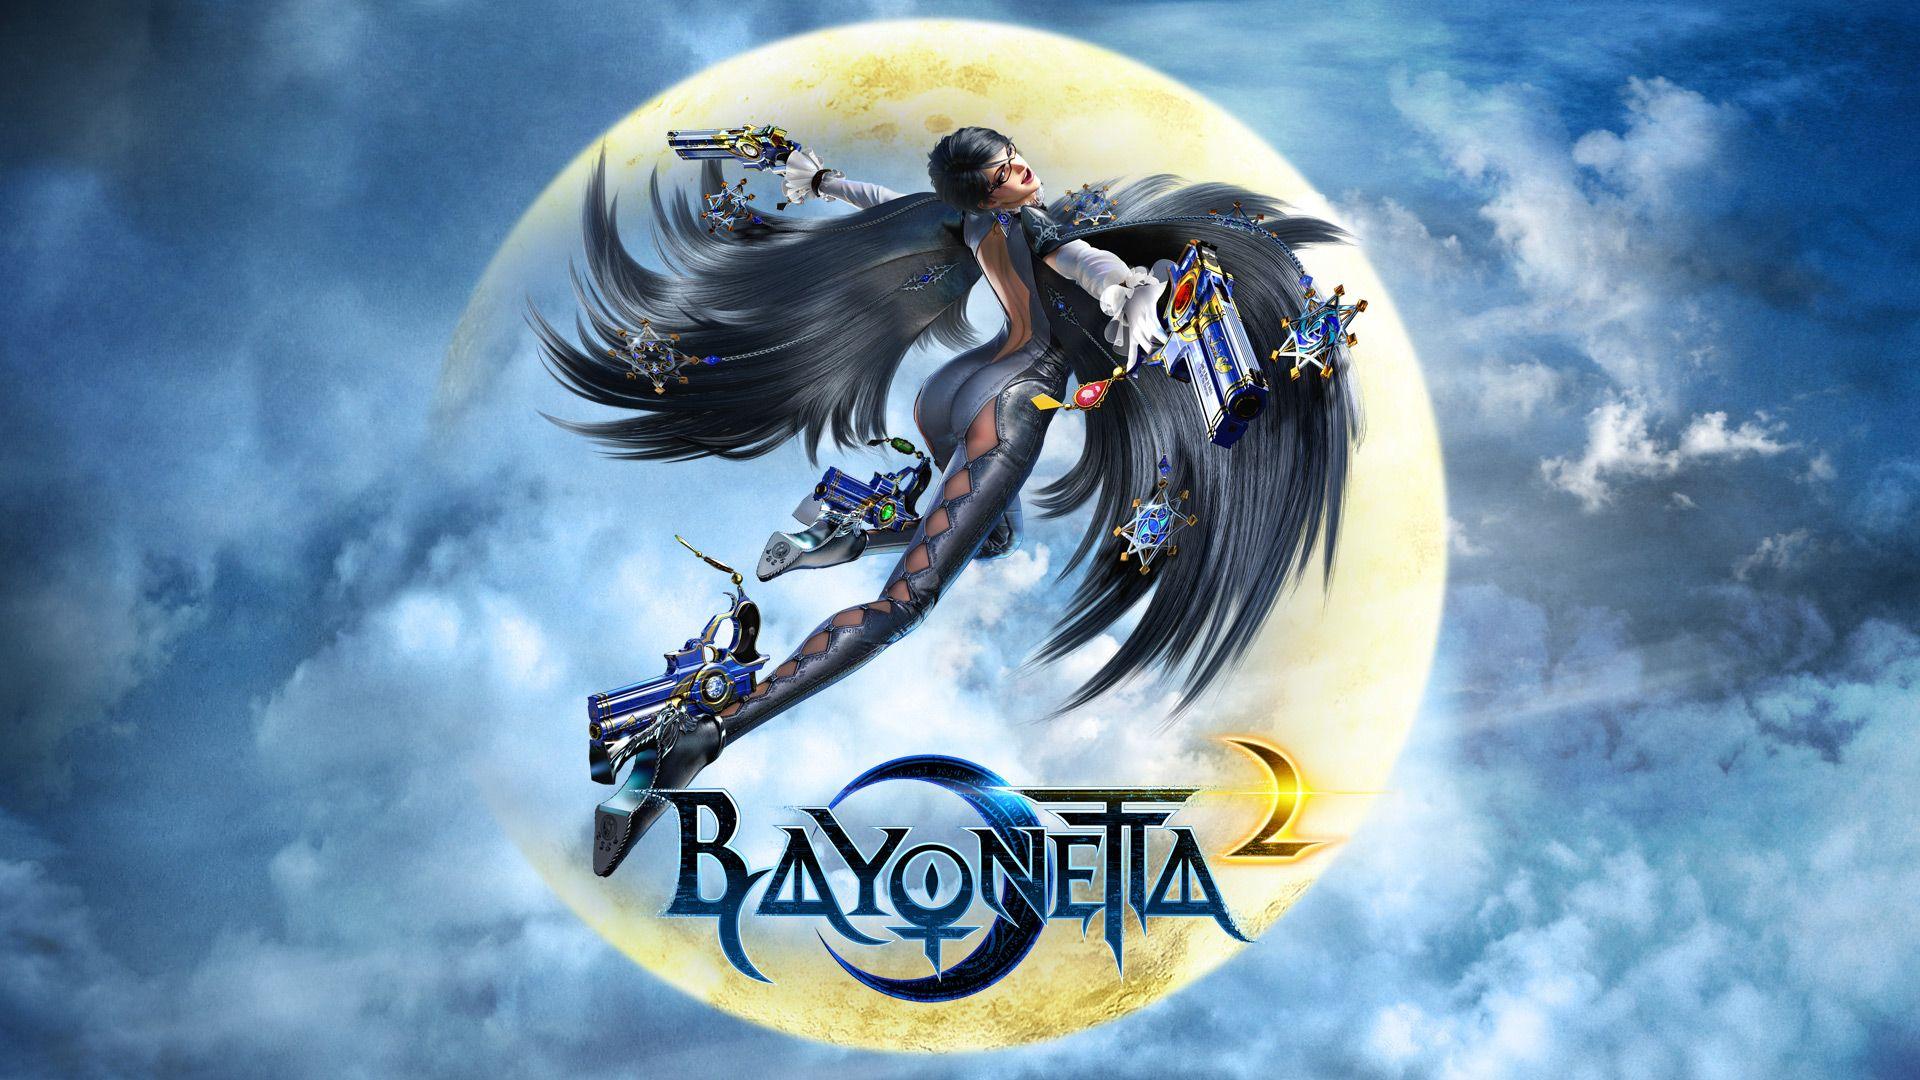 Bayonetta Wallpaper 1080p